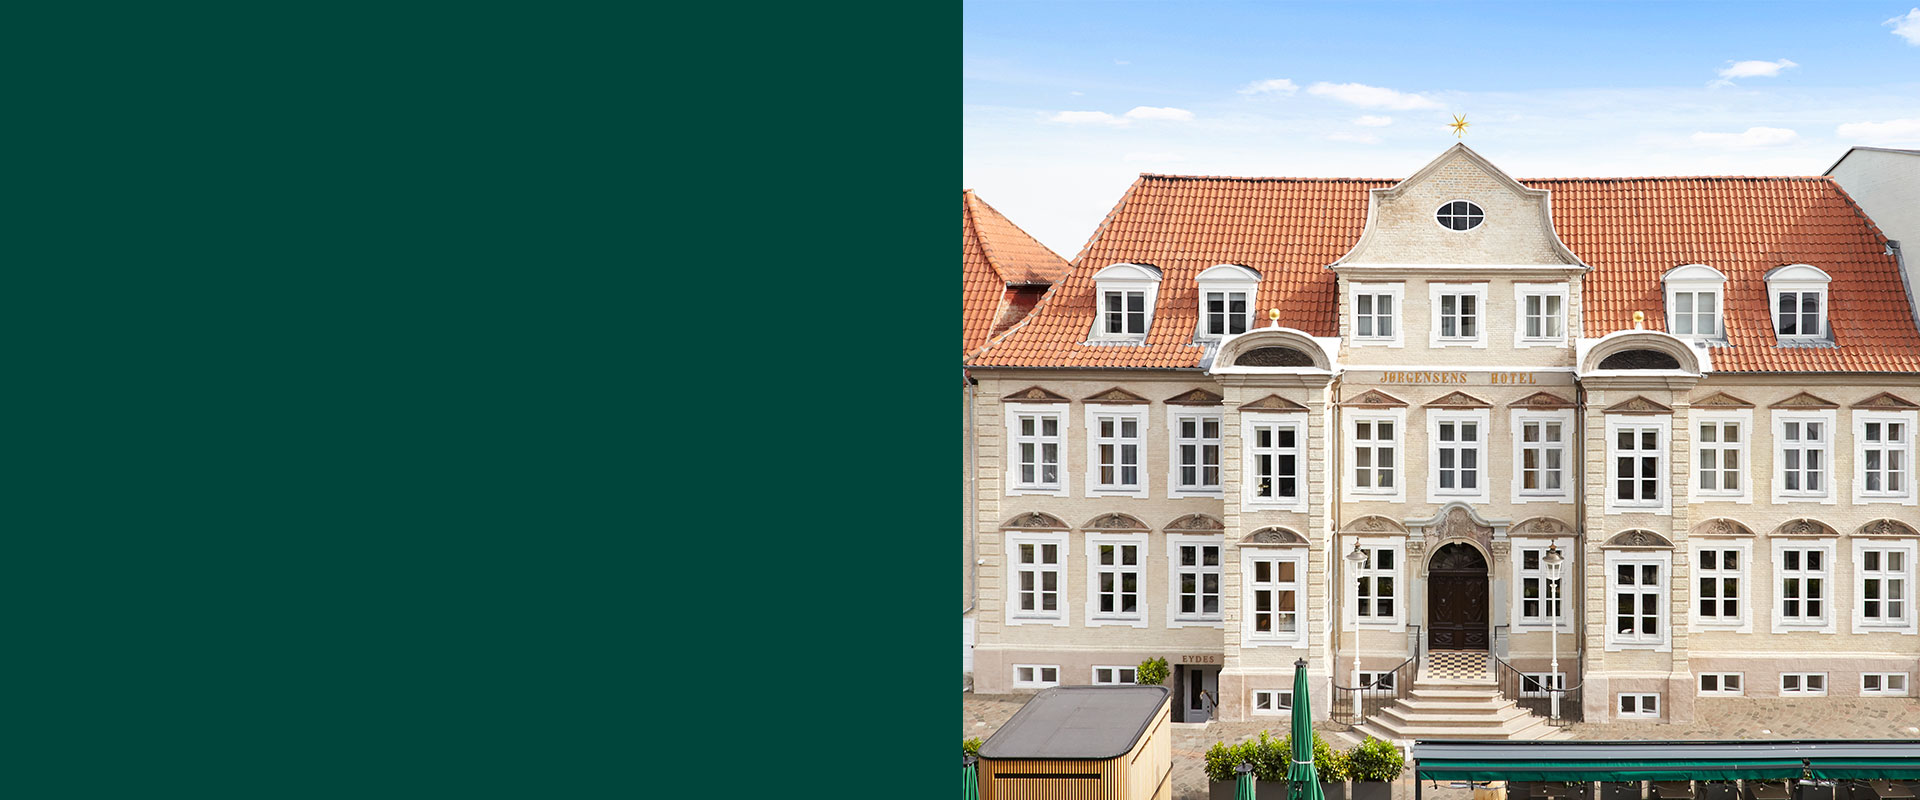 renovering, hotel, Oluf Jørgensen A/S, reference